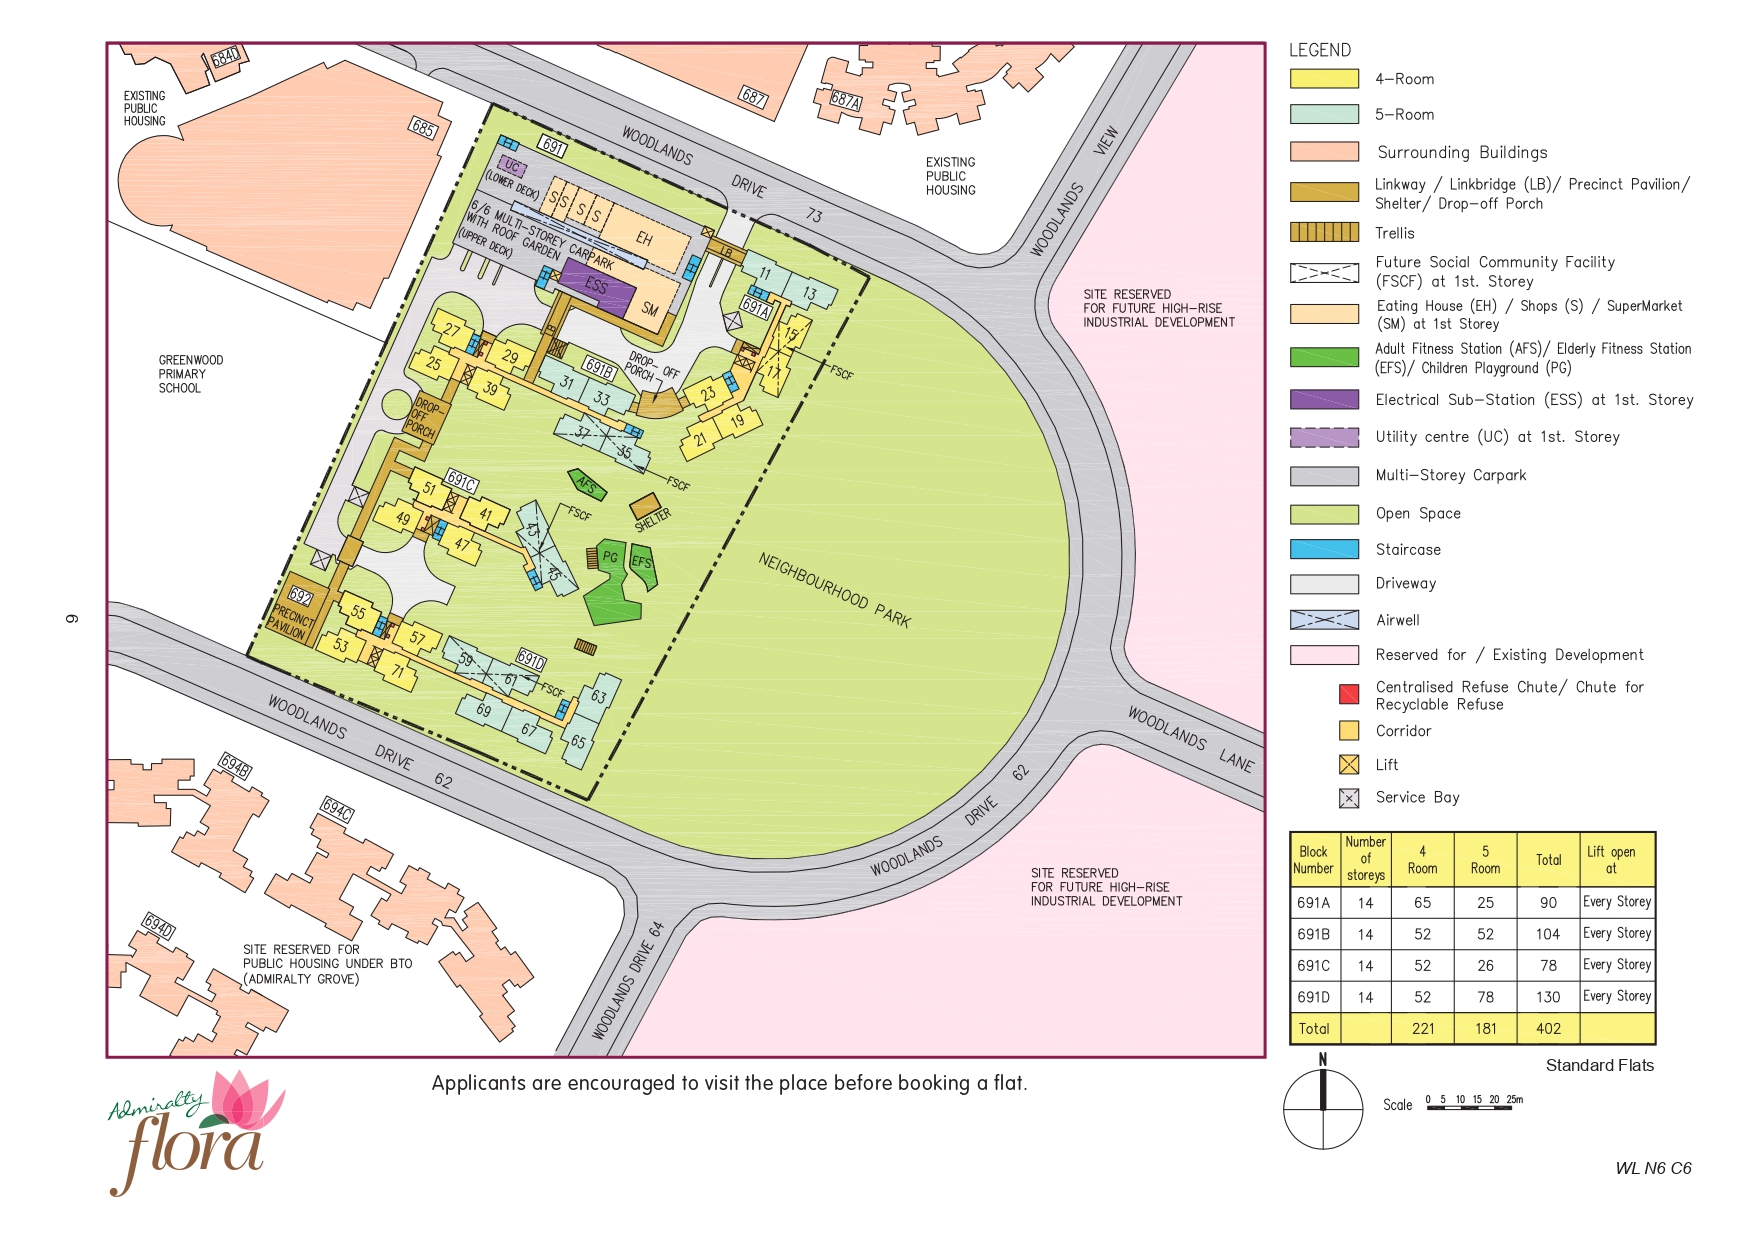 Admiralty Flora Site Plan